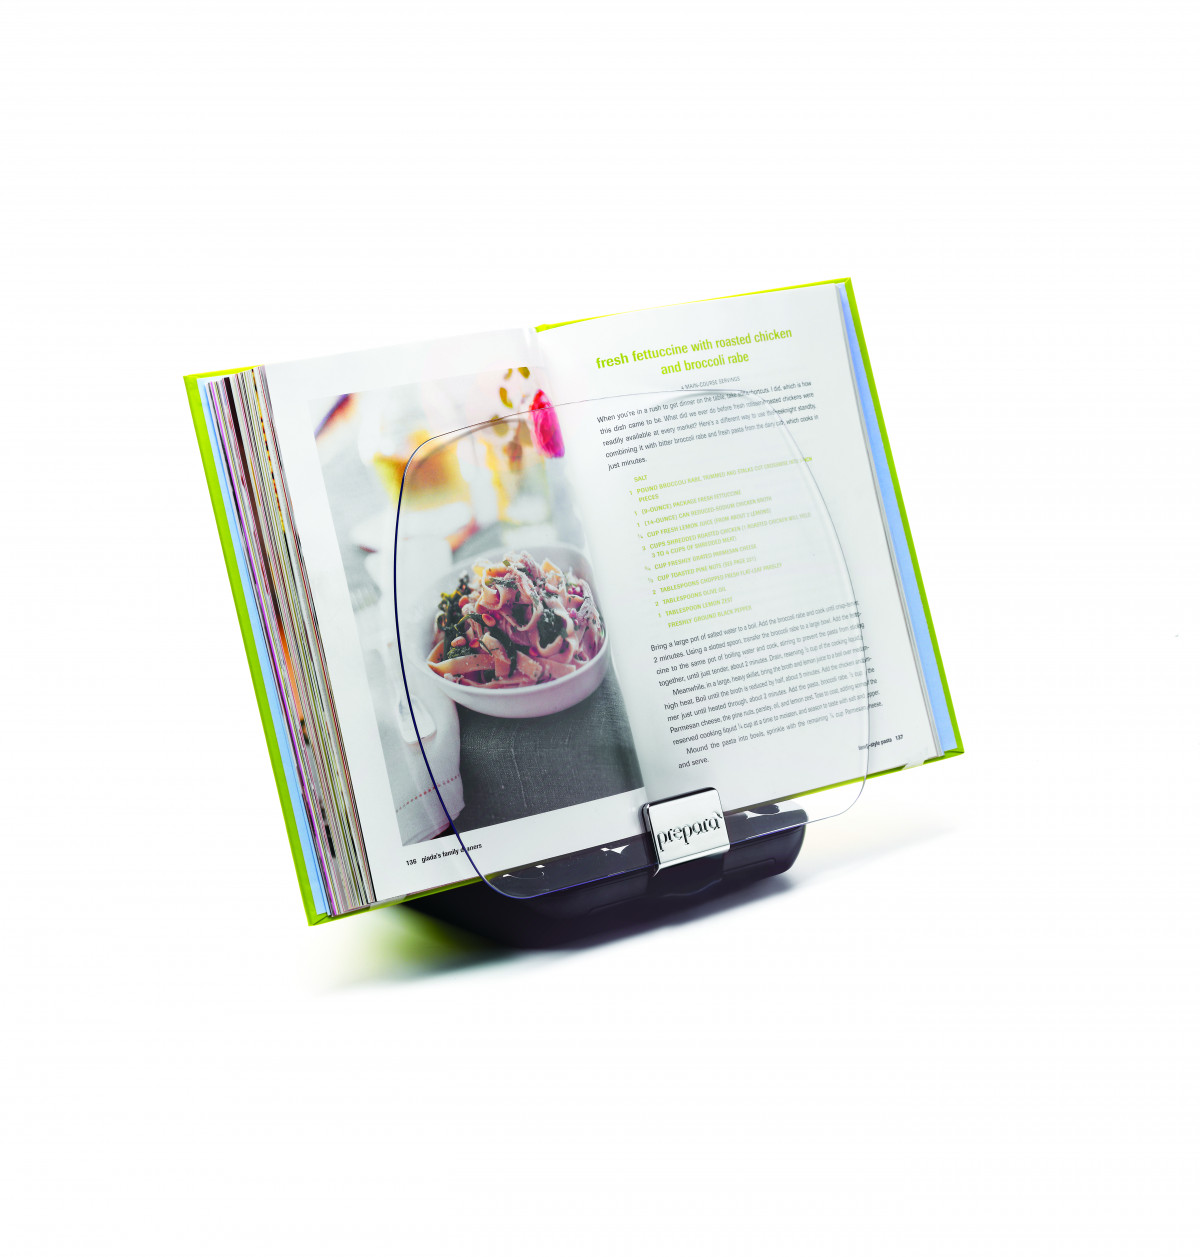 lutrin de cuisine rotatif pliable - noir - n2j